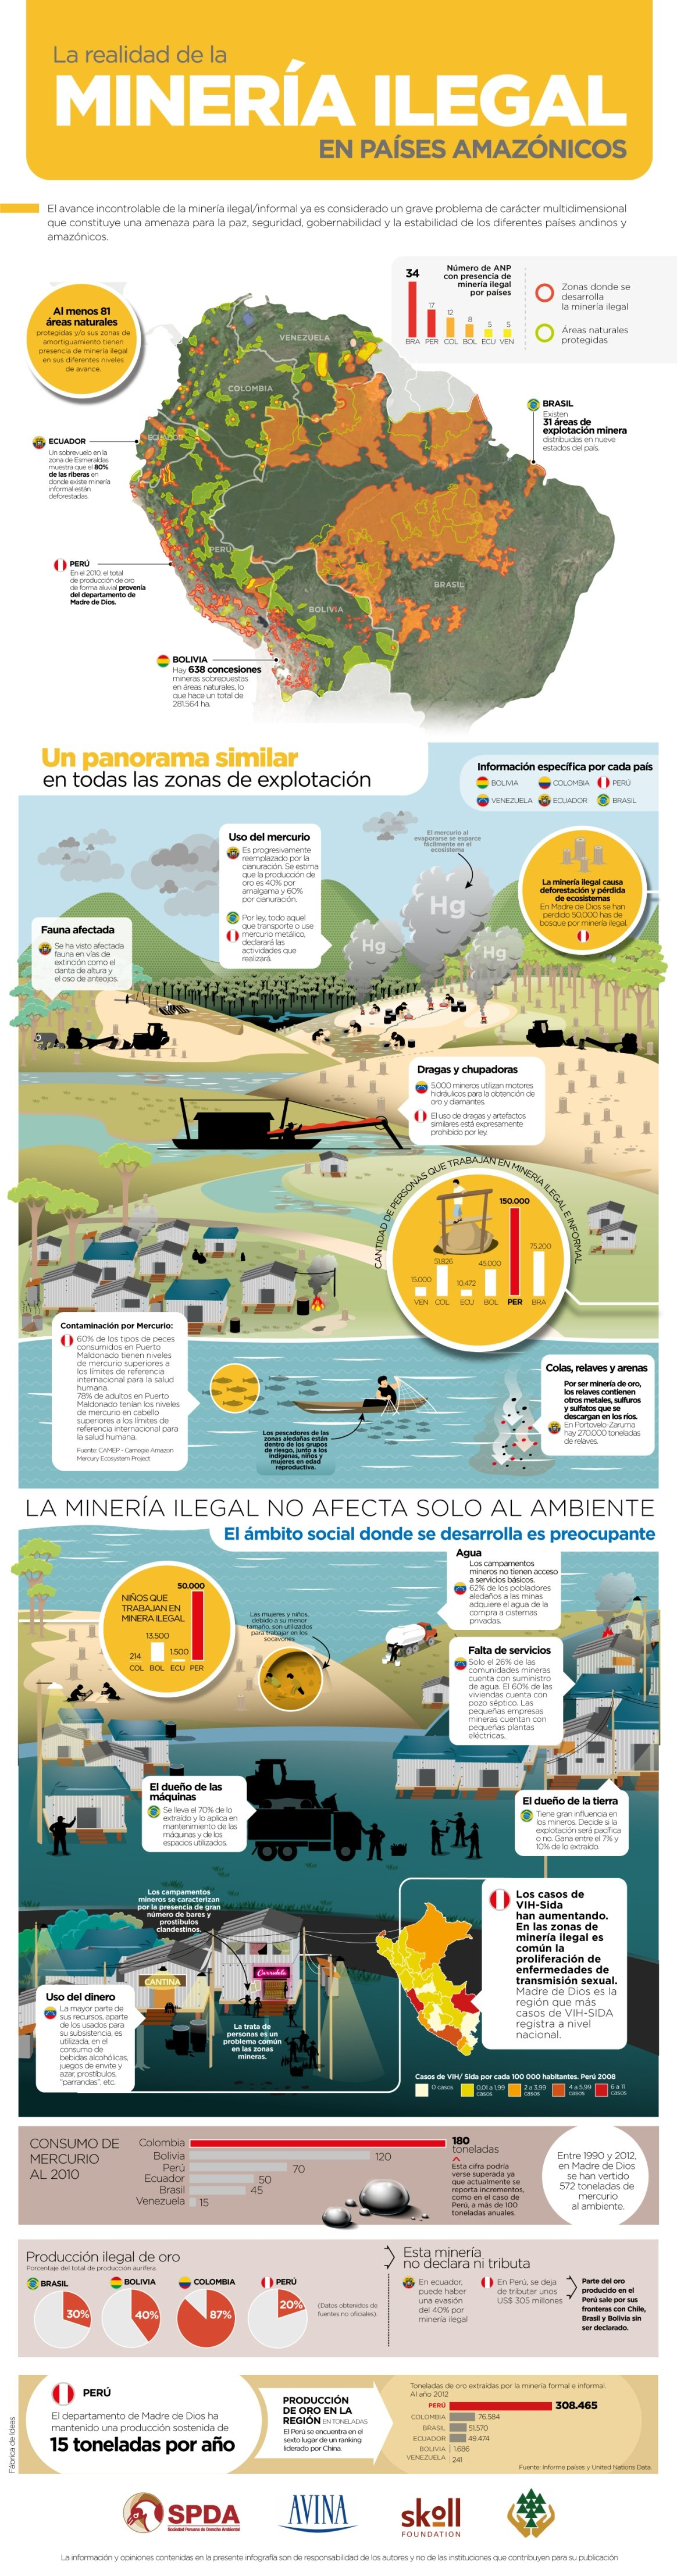 Infografia_Mineria-Ilegal en países amazónicos